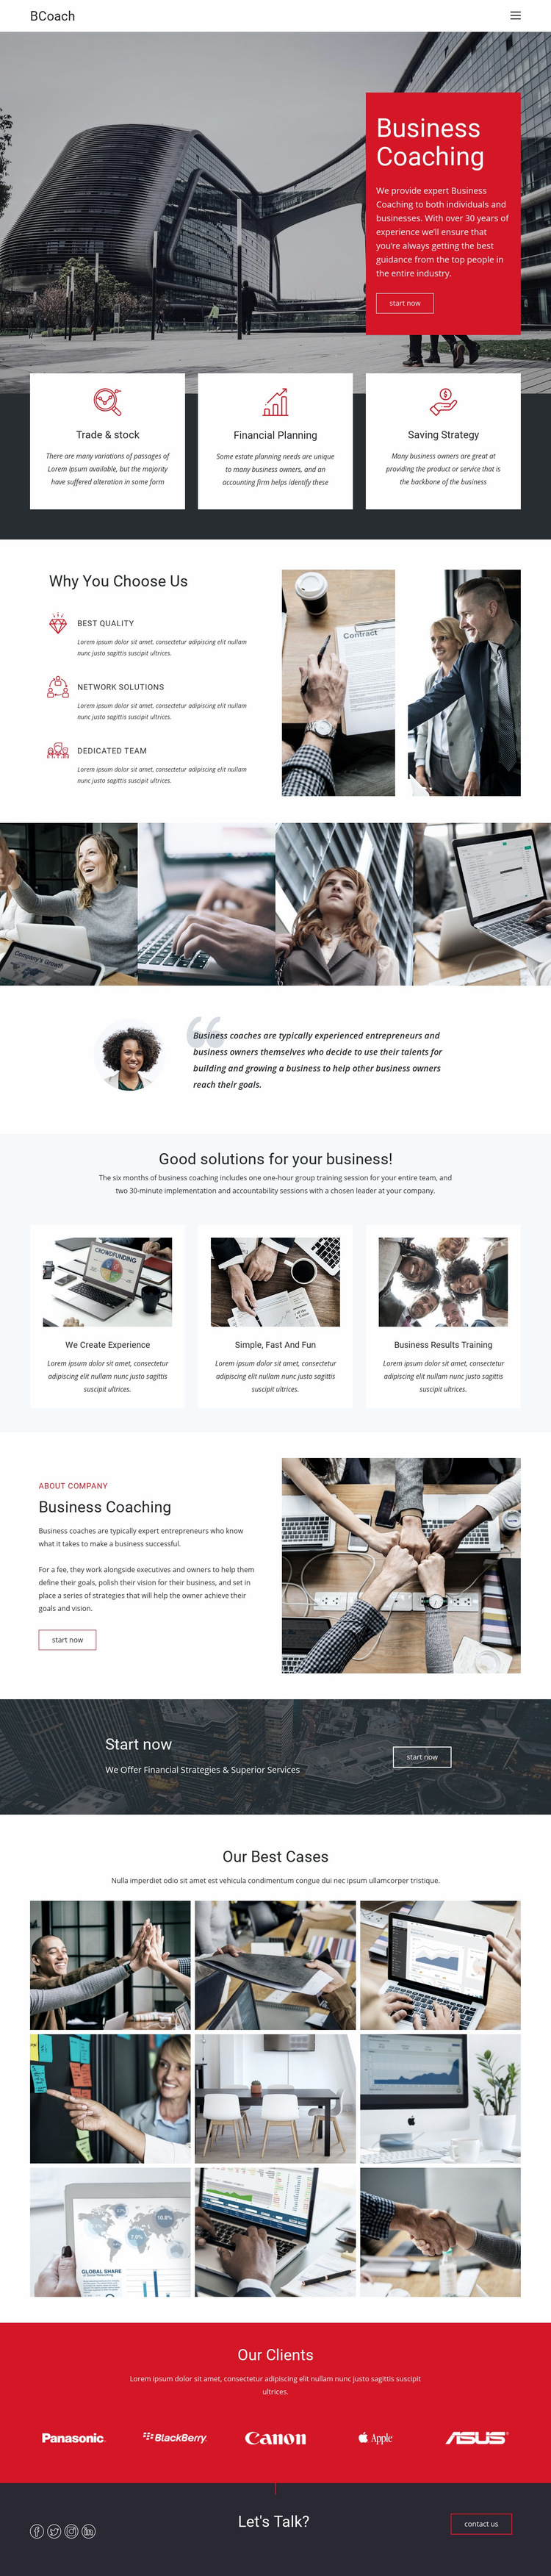 Executive coaching Web Page Design